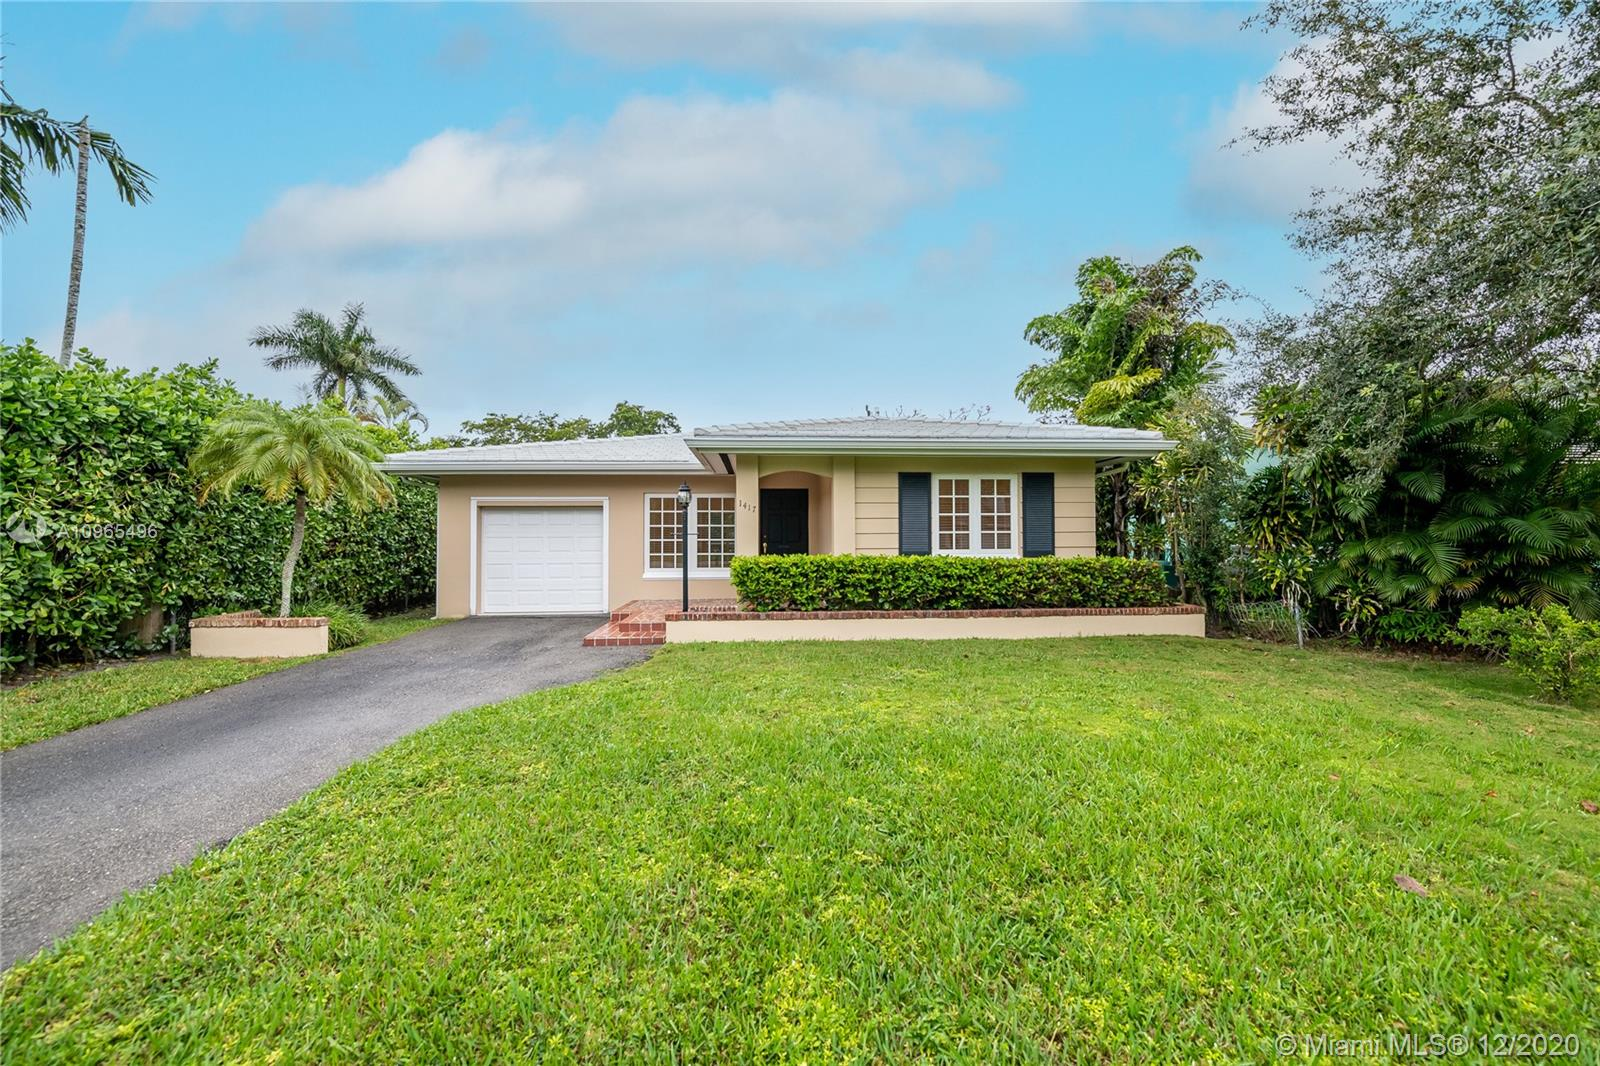 South Miami - 1417 Cantoria Ave, Coral Gables, FL 33146